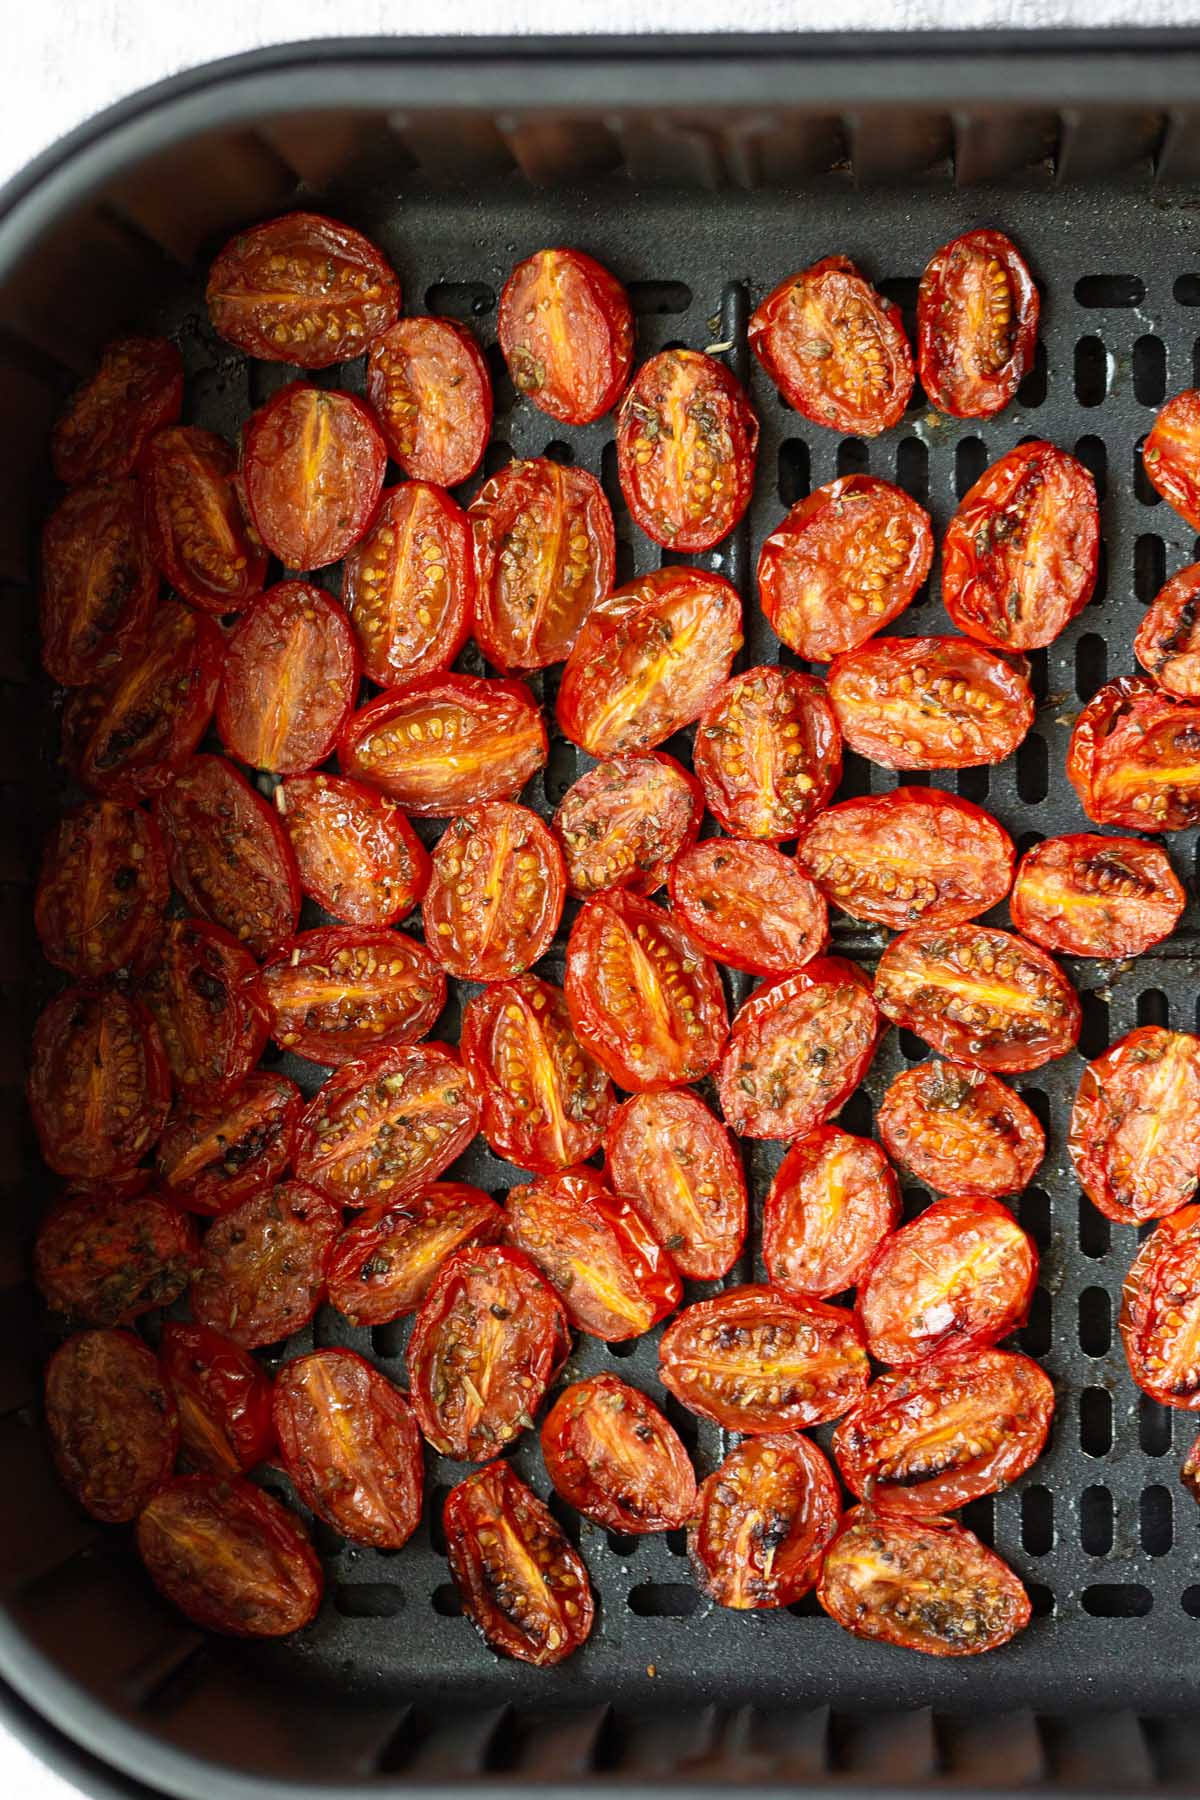 roasted tomatoes in air fryer basket